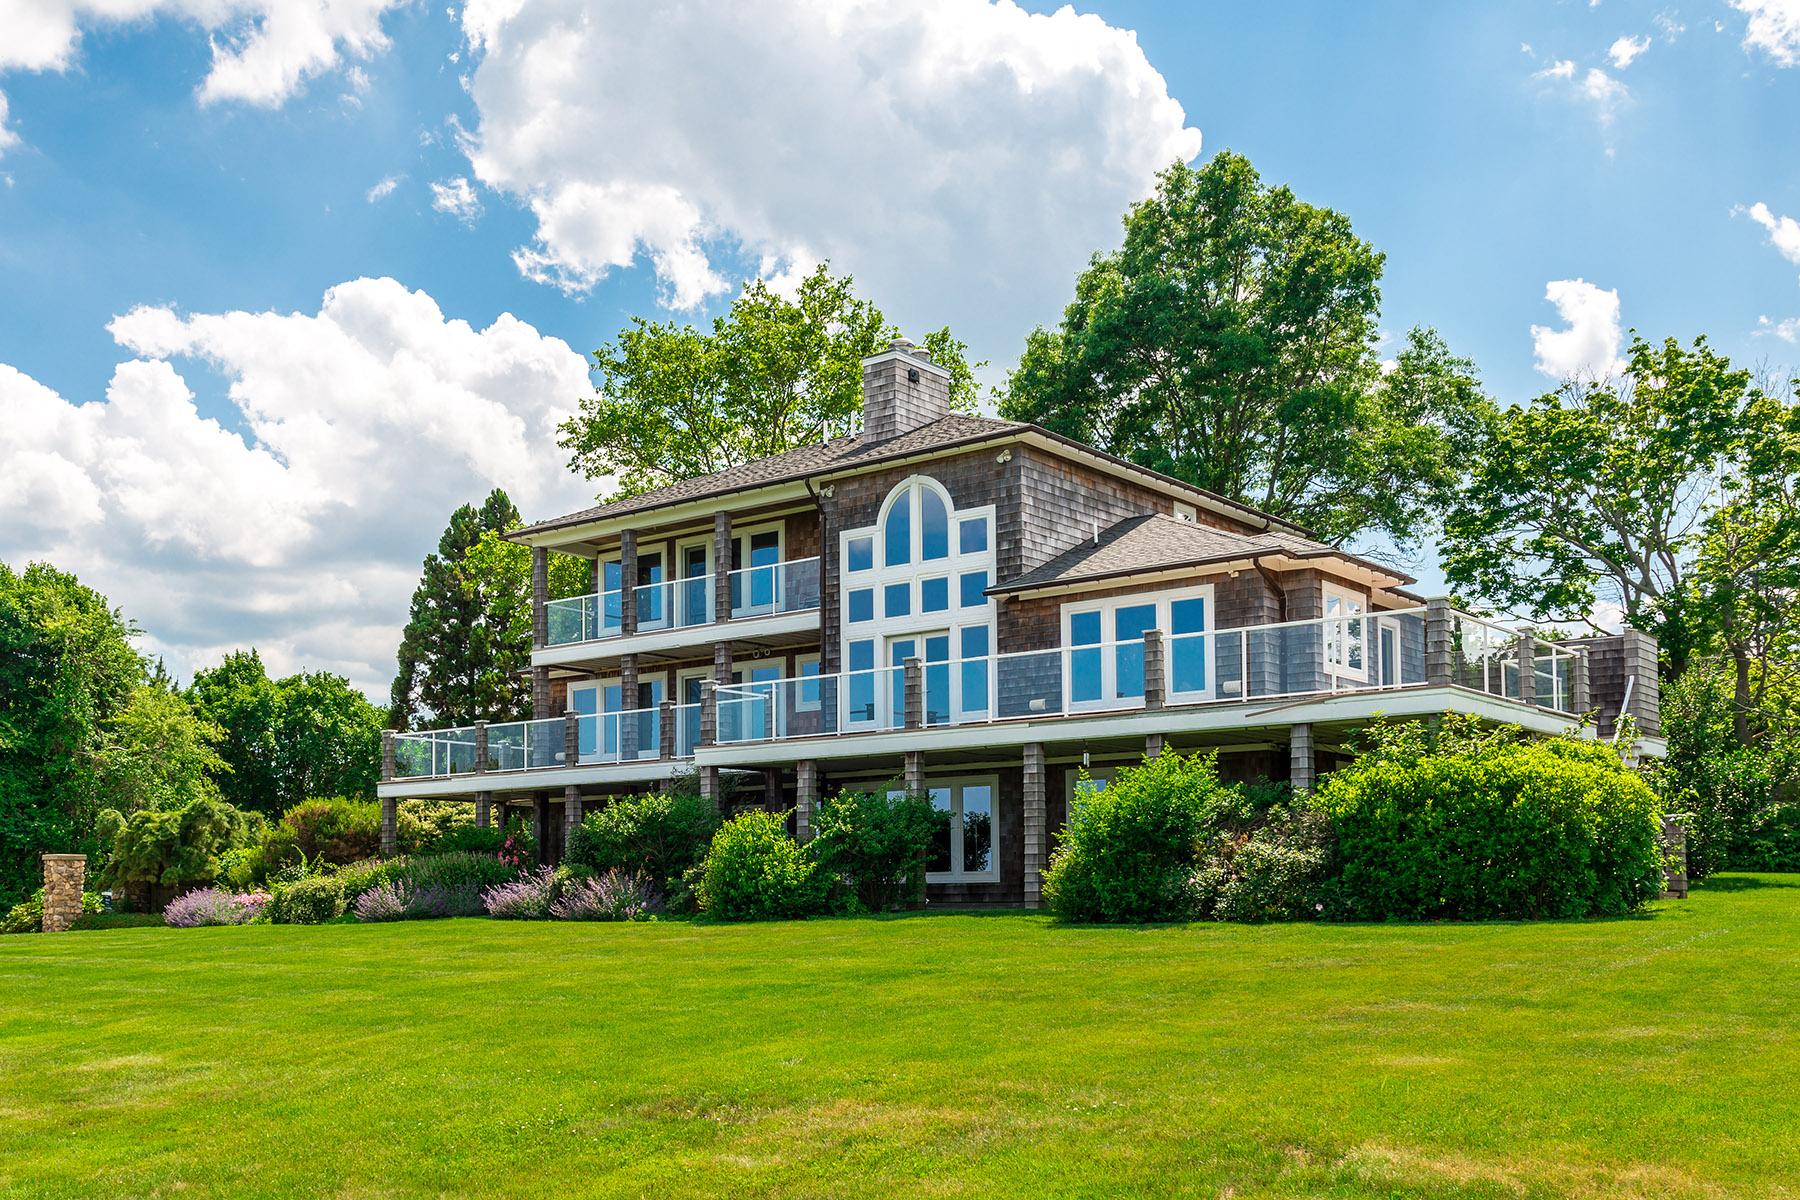 Villa per Vendita alle ore 2 Browning Drive Narragansett, Rhode Island 02882 Stati Uniti